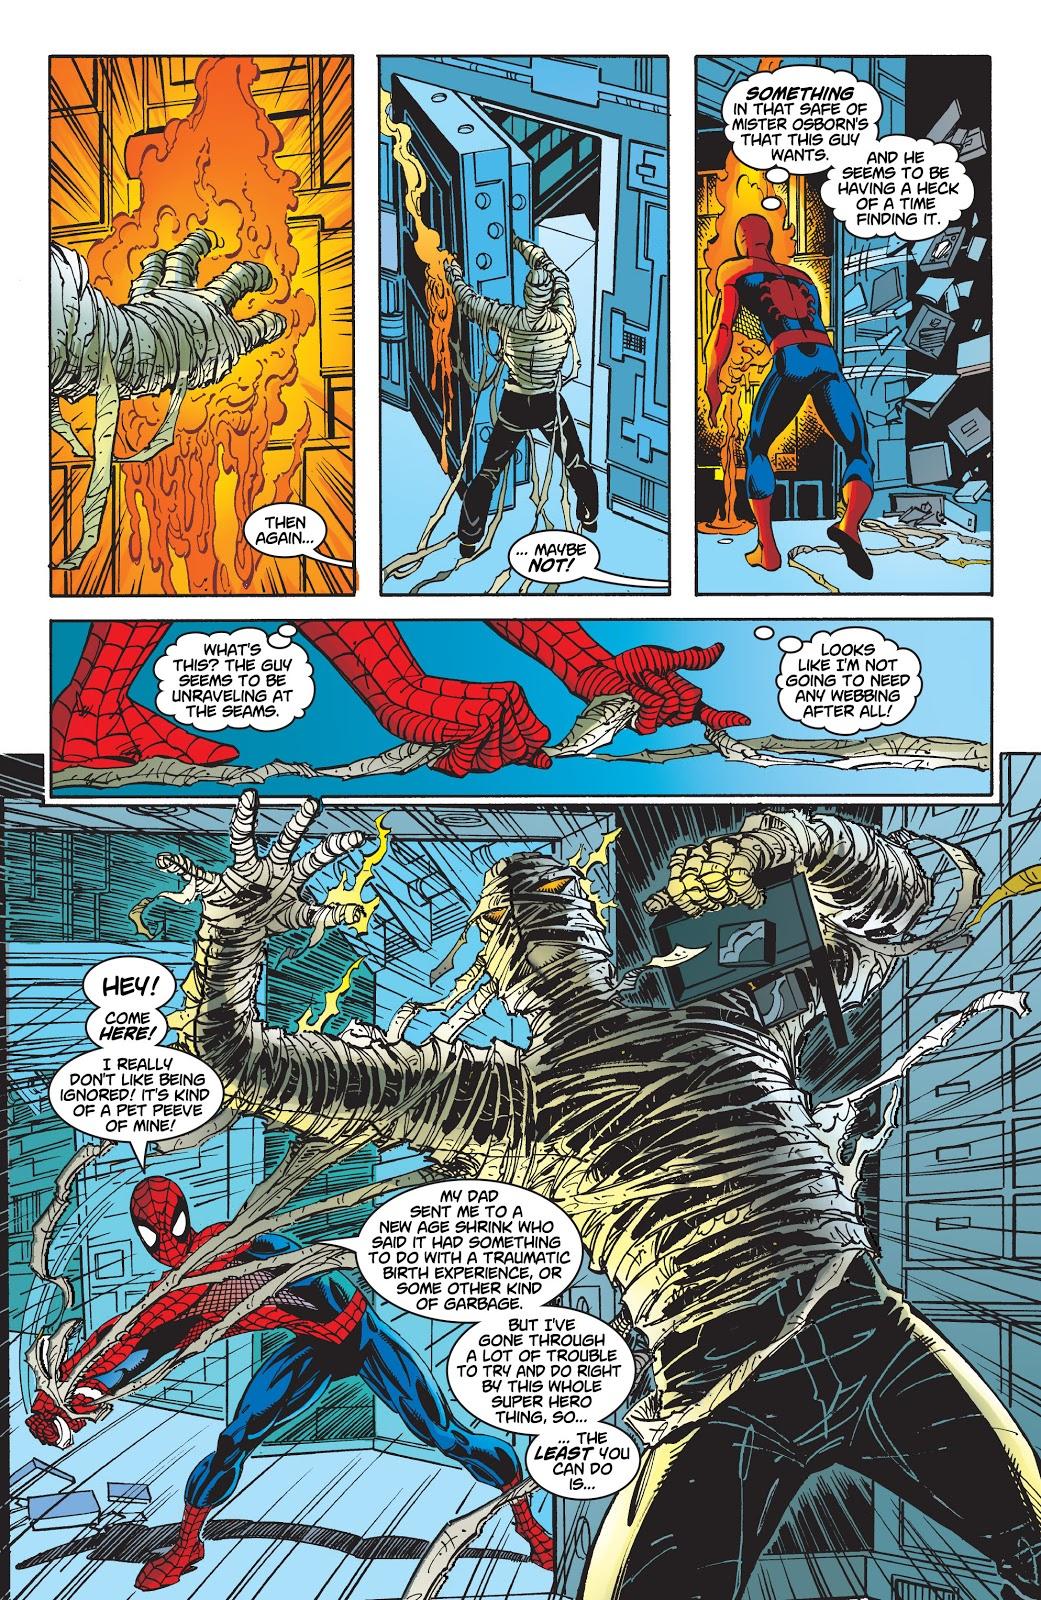 Spider-Man (Martha Franklin) VS Shadrac